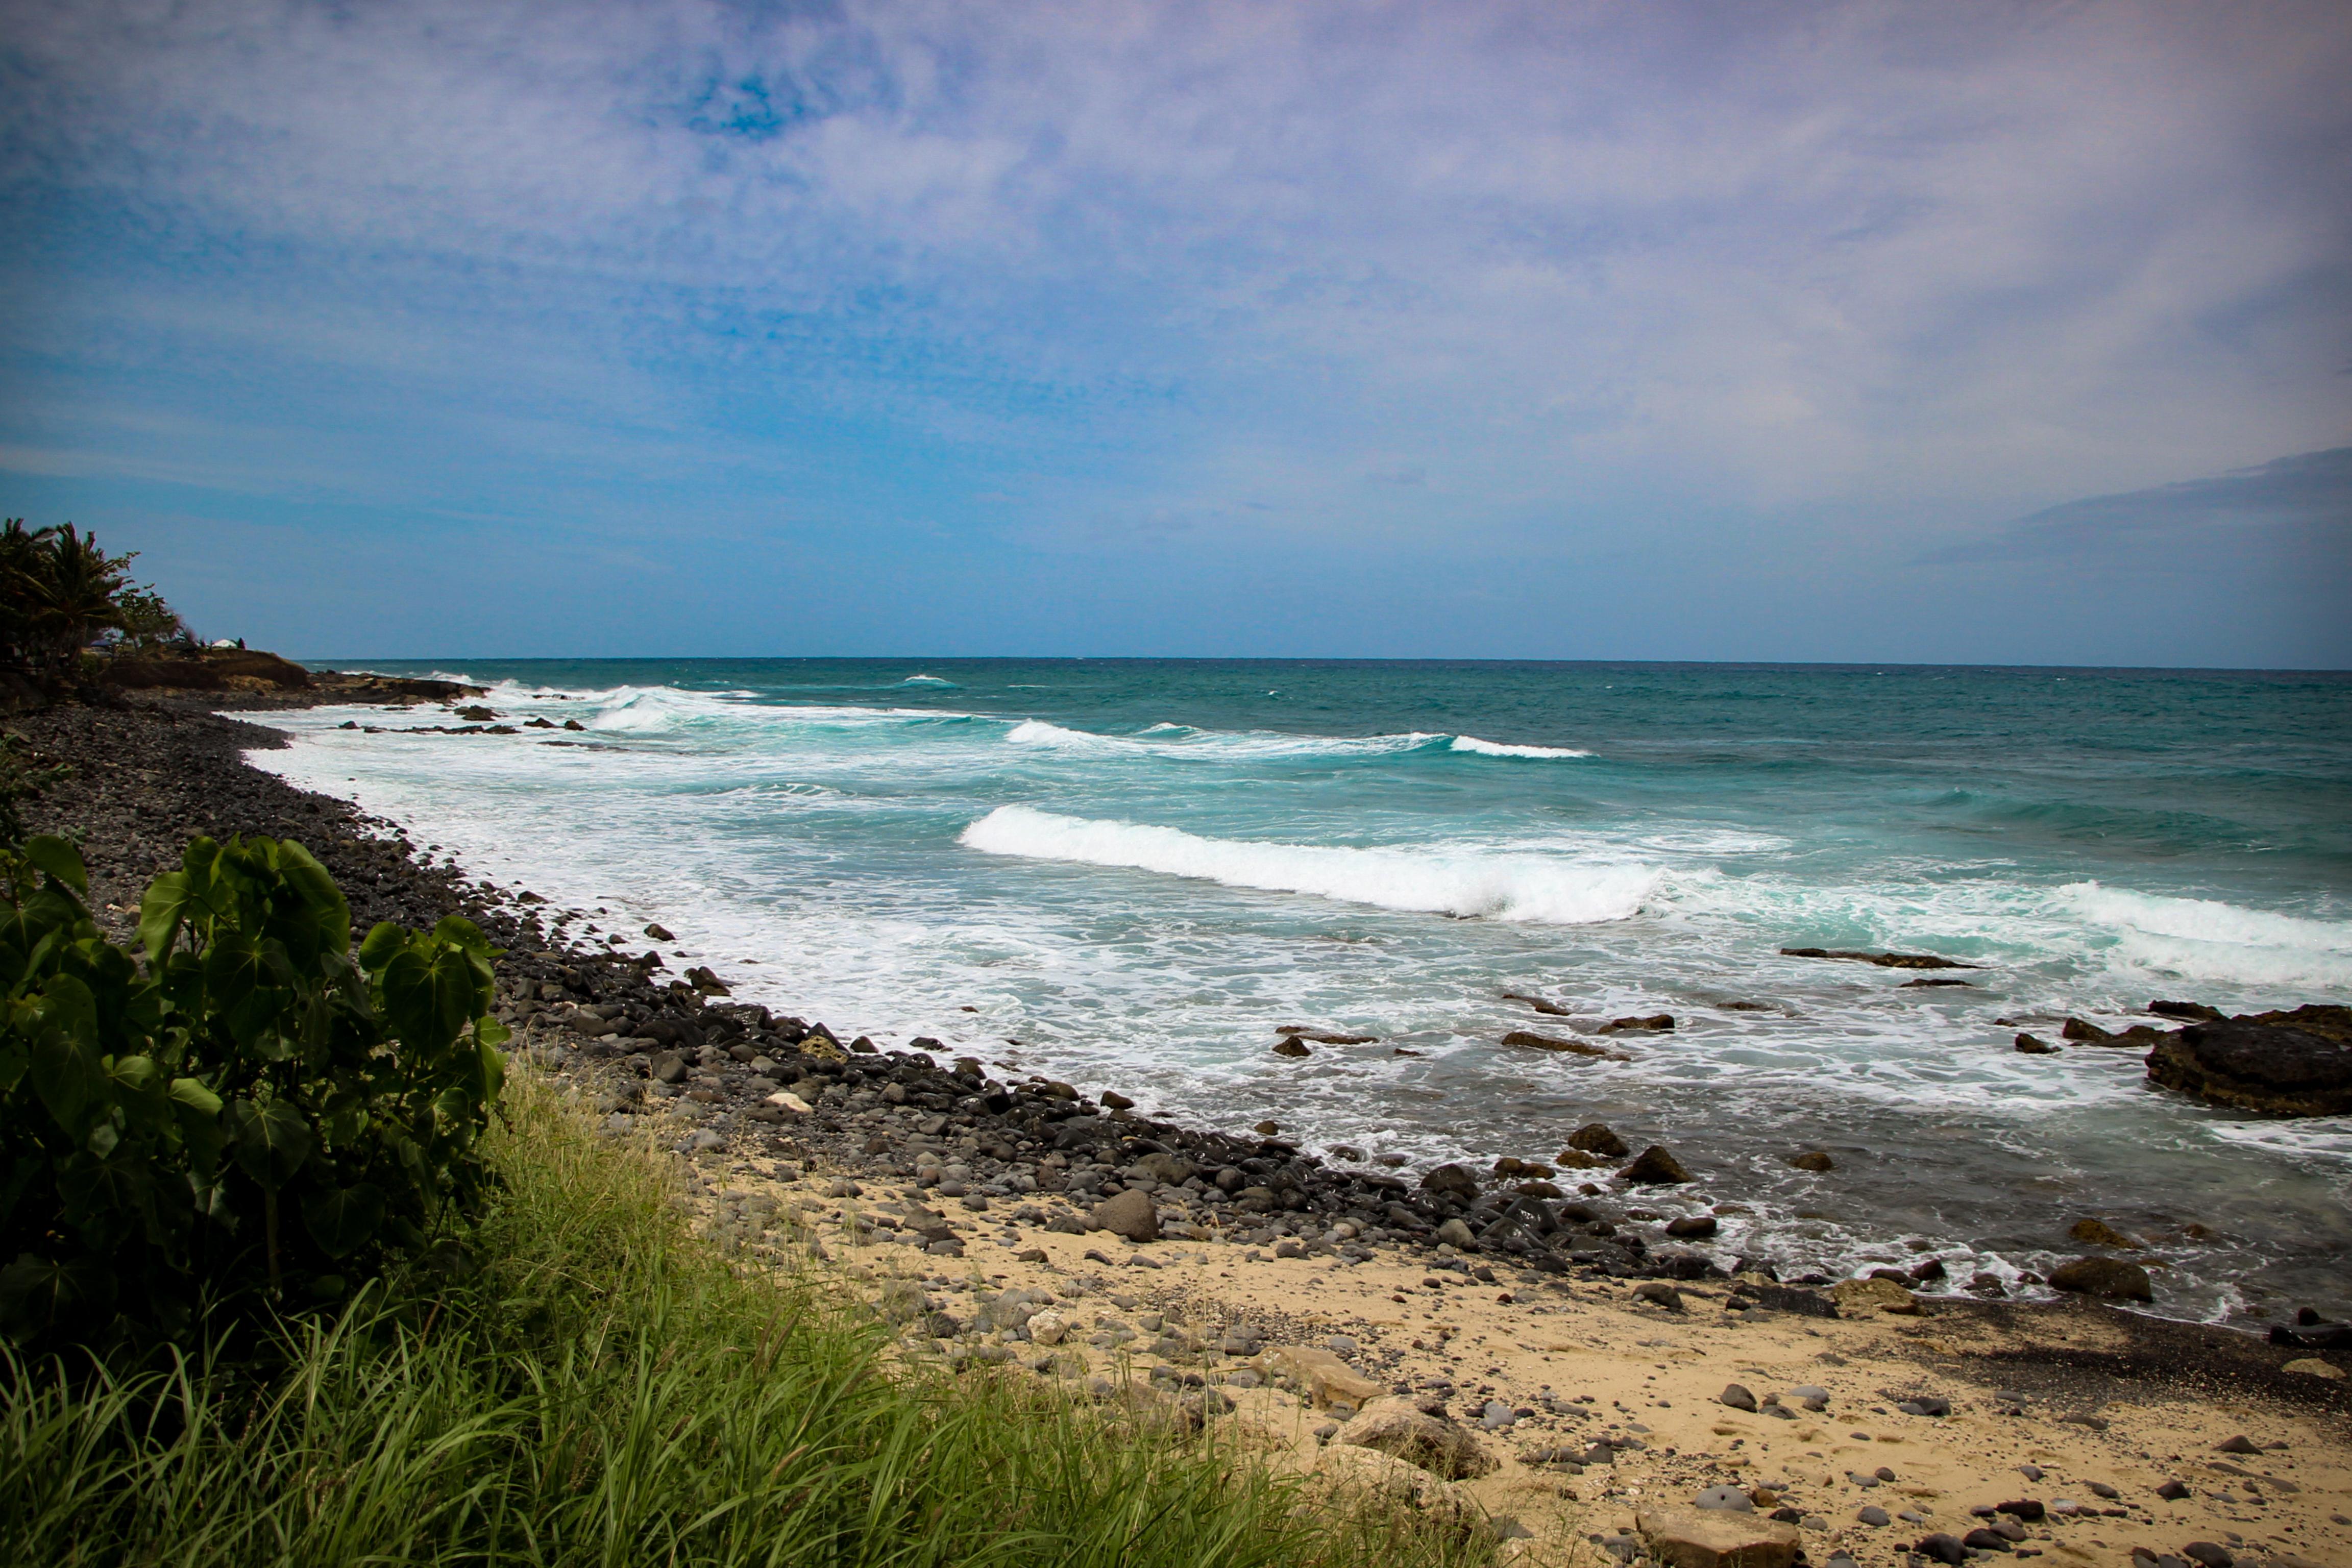 Ohikilolo Beach